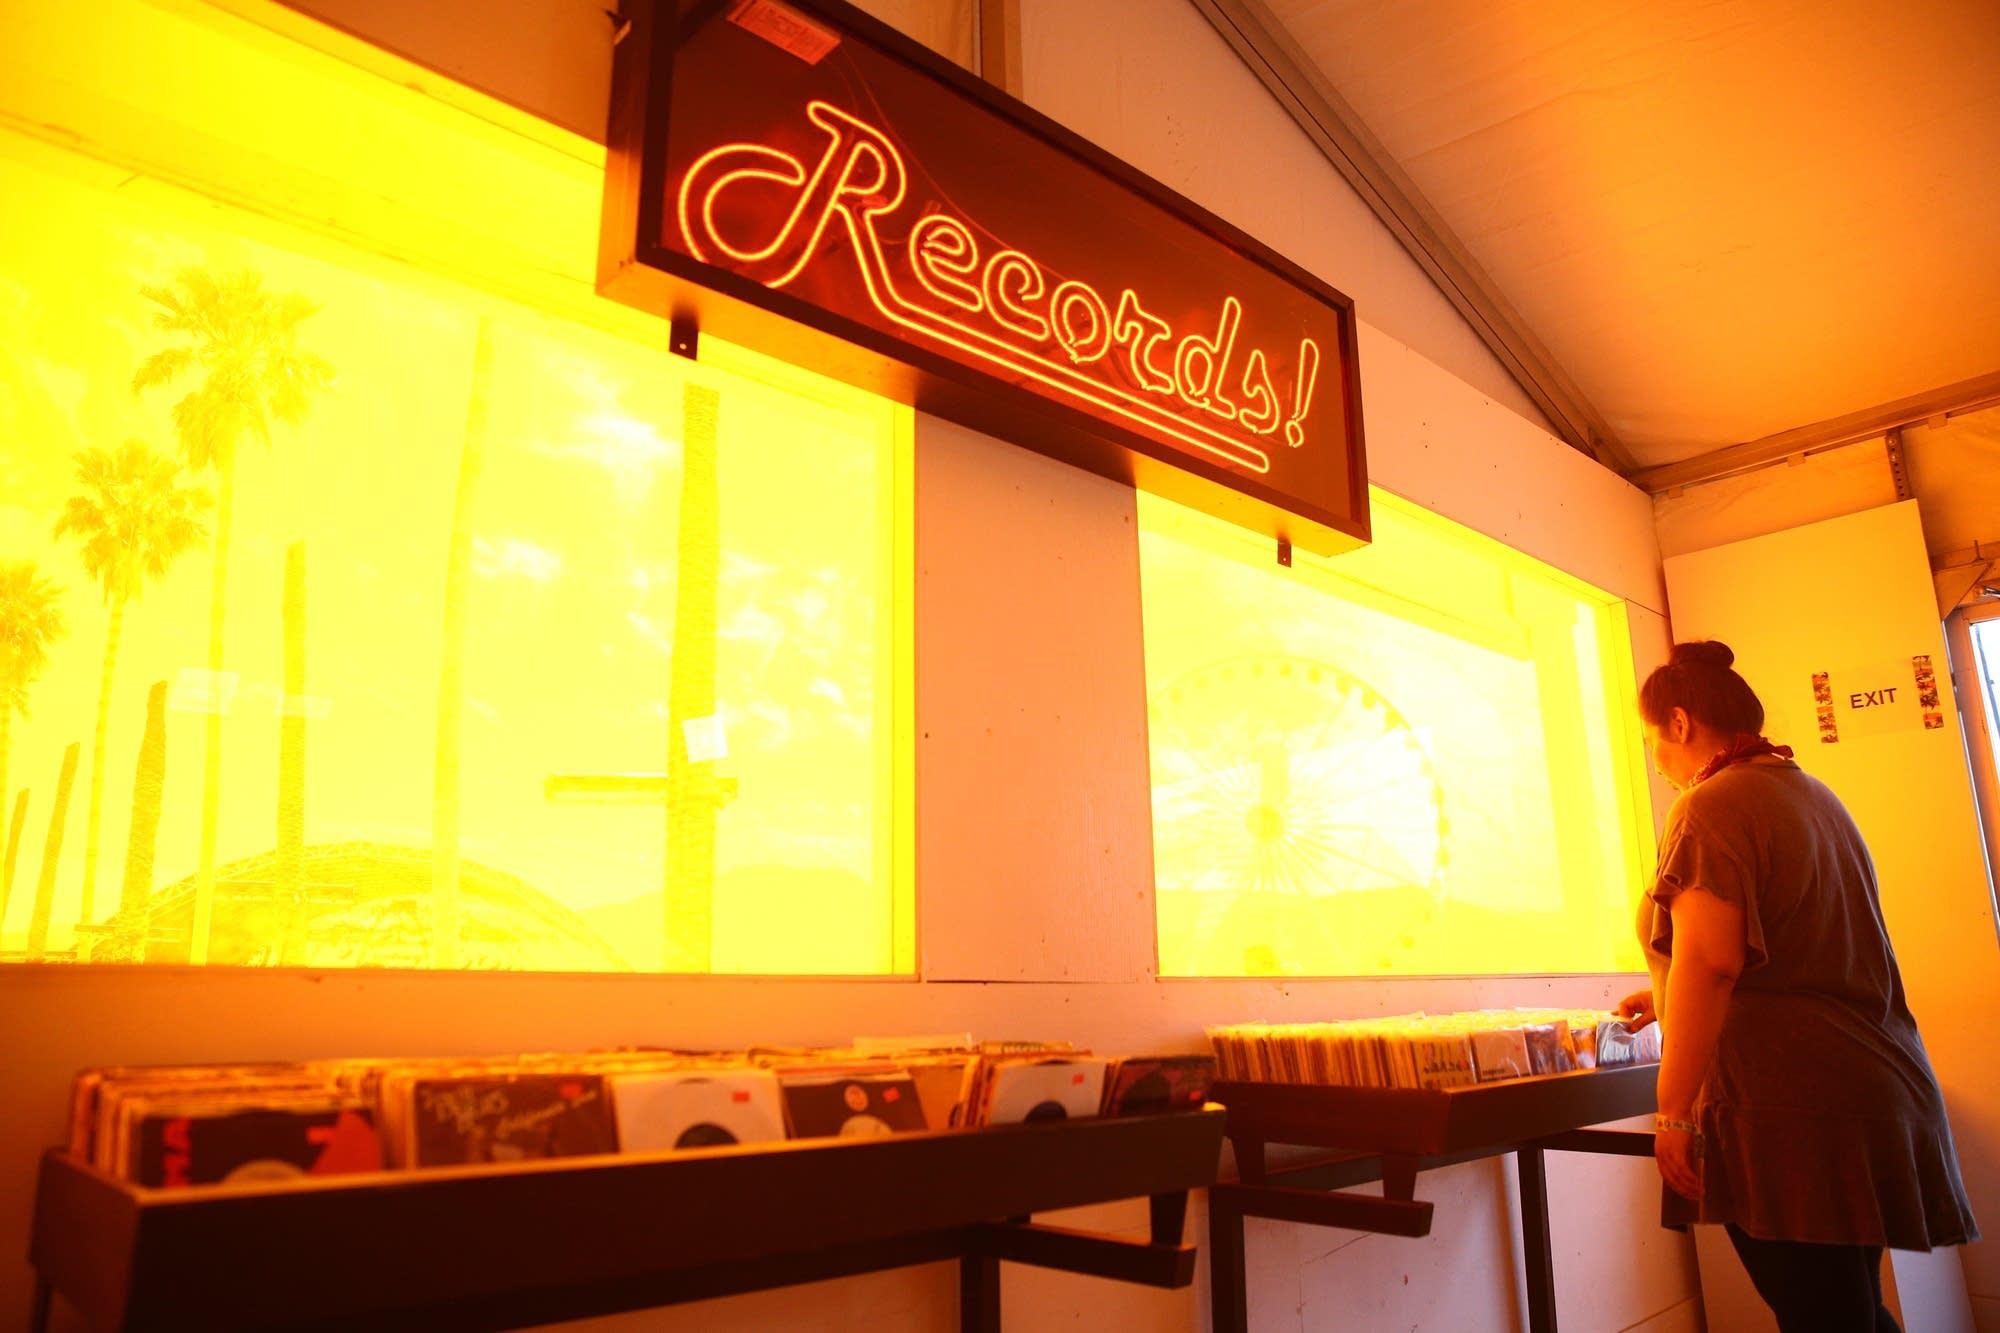 Record shopping at Coachella, 2018.